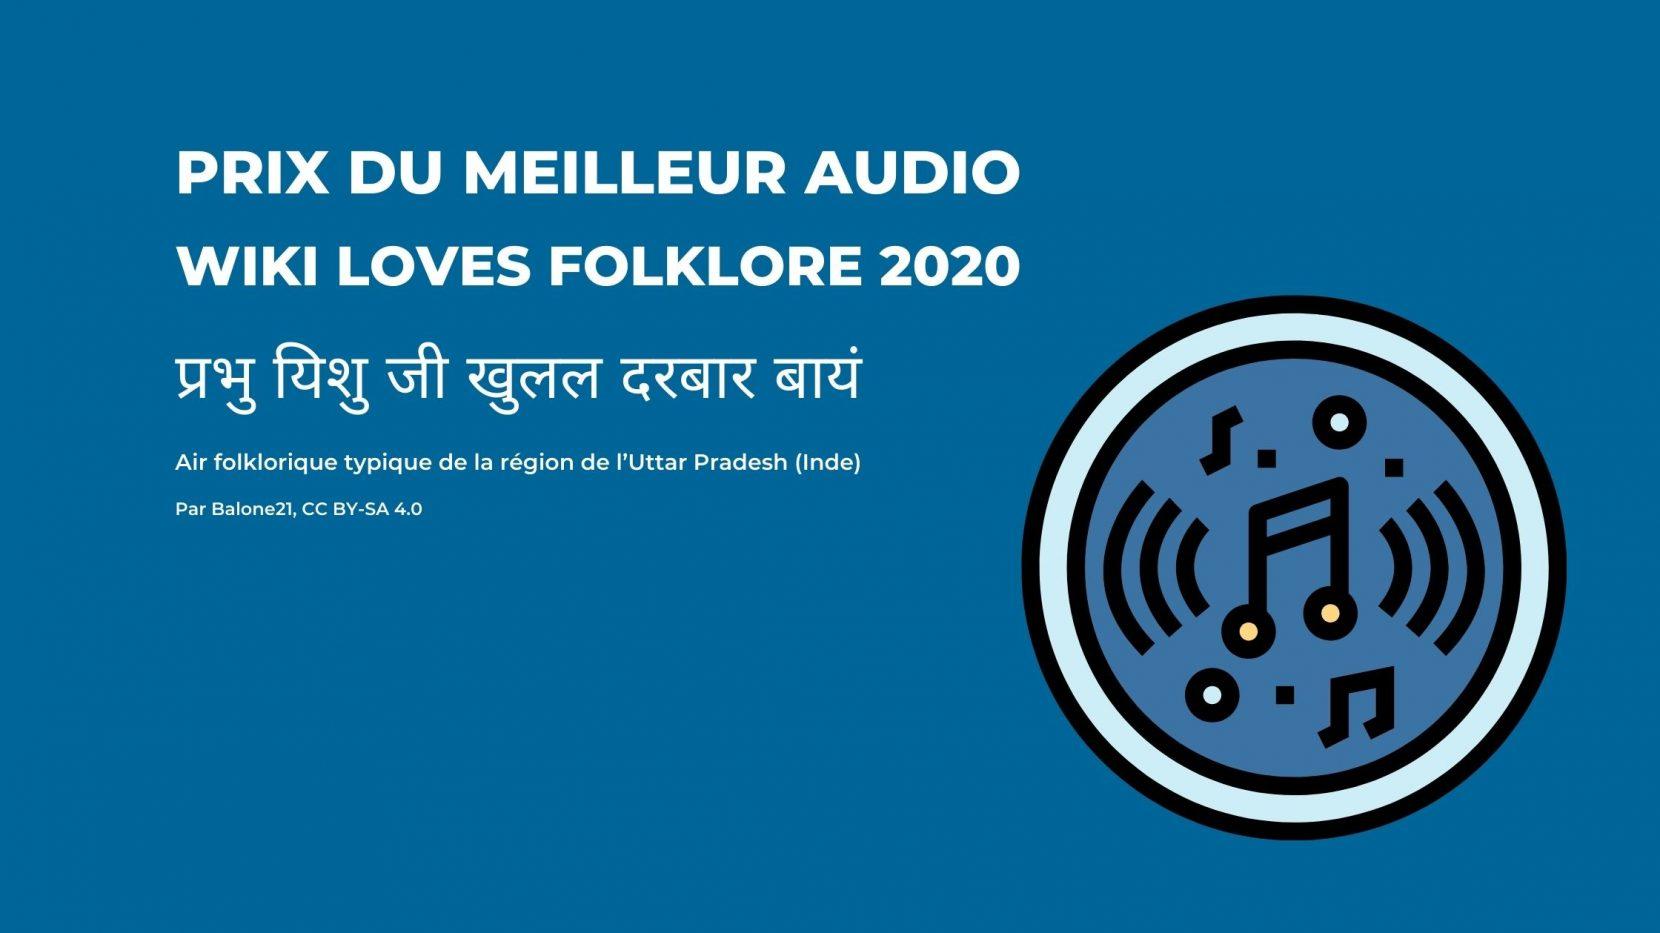 Wiki Loves Folklore 2020